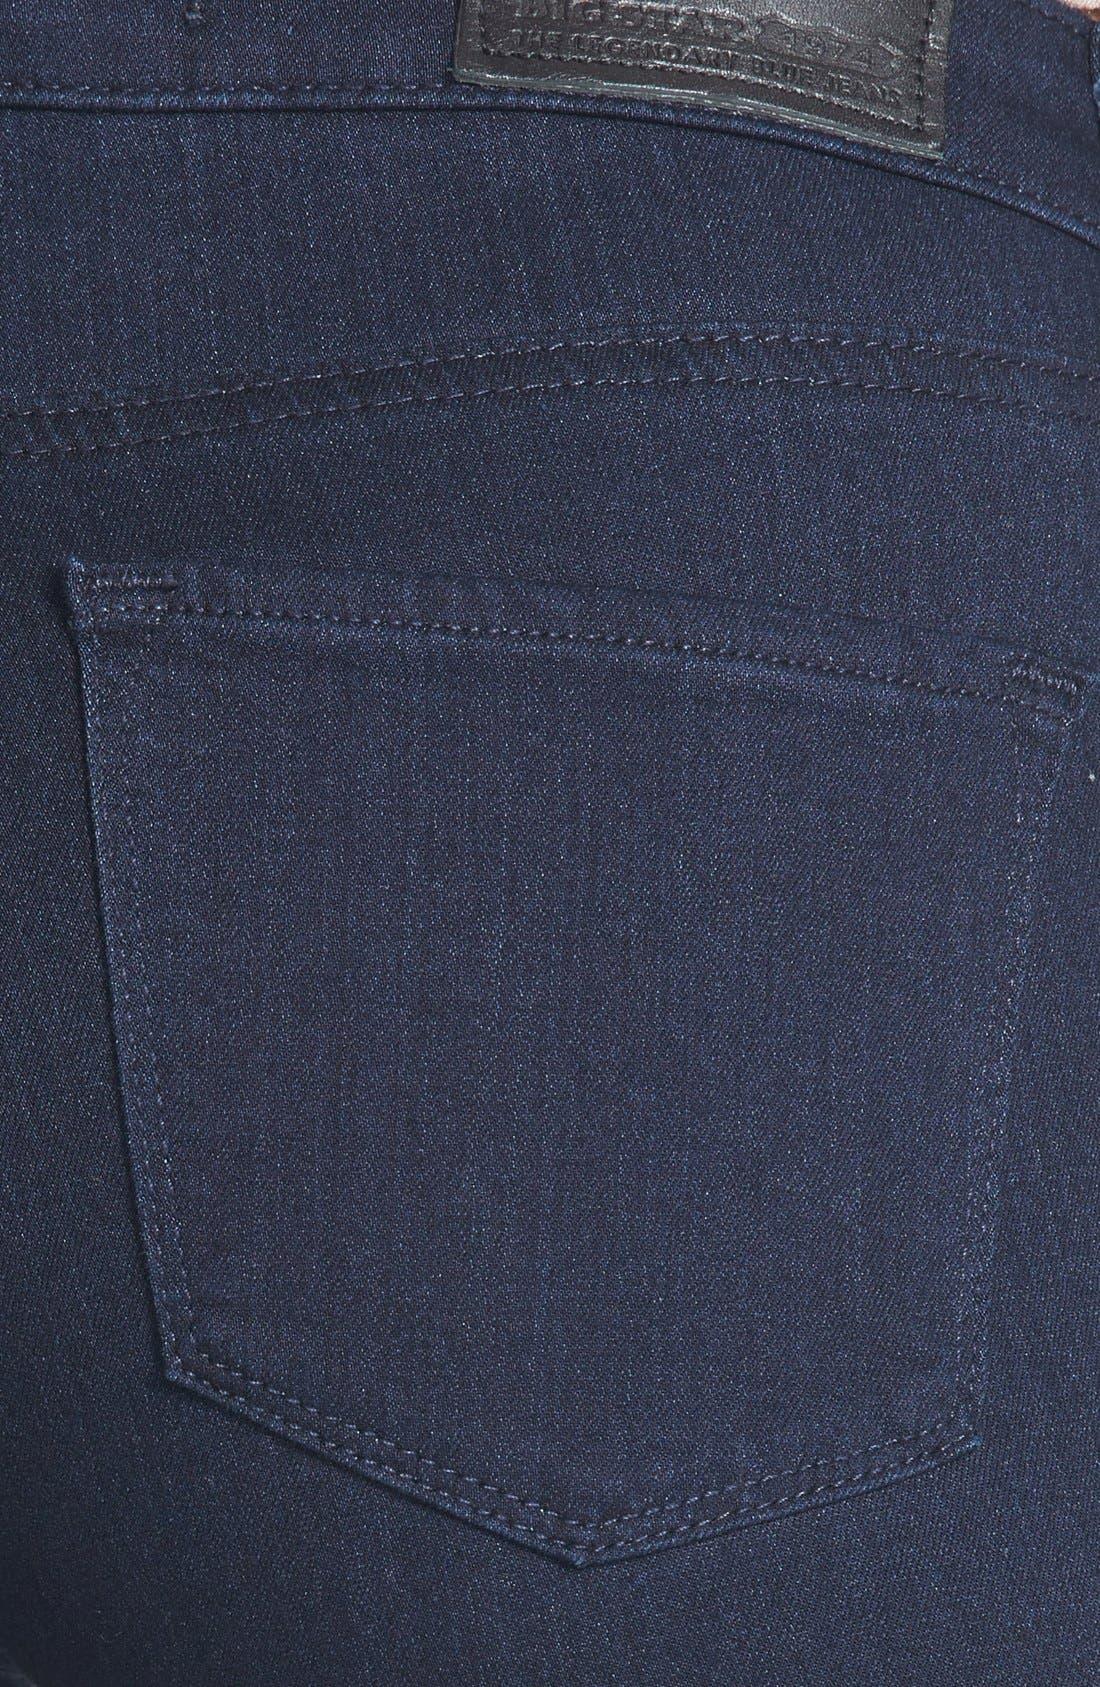 Alternate Image 3  - Big Star 'Ava' Jeans Super Skinny Stretch Jeans (Harmony Dark) (Petite)